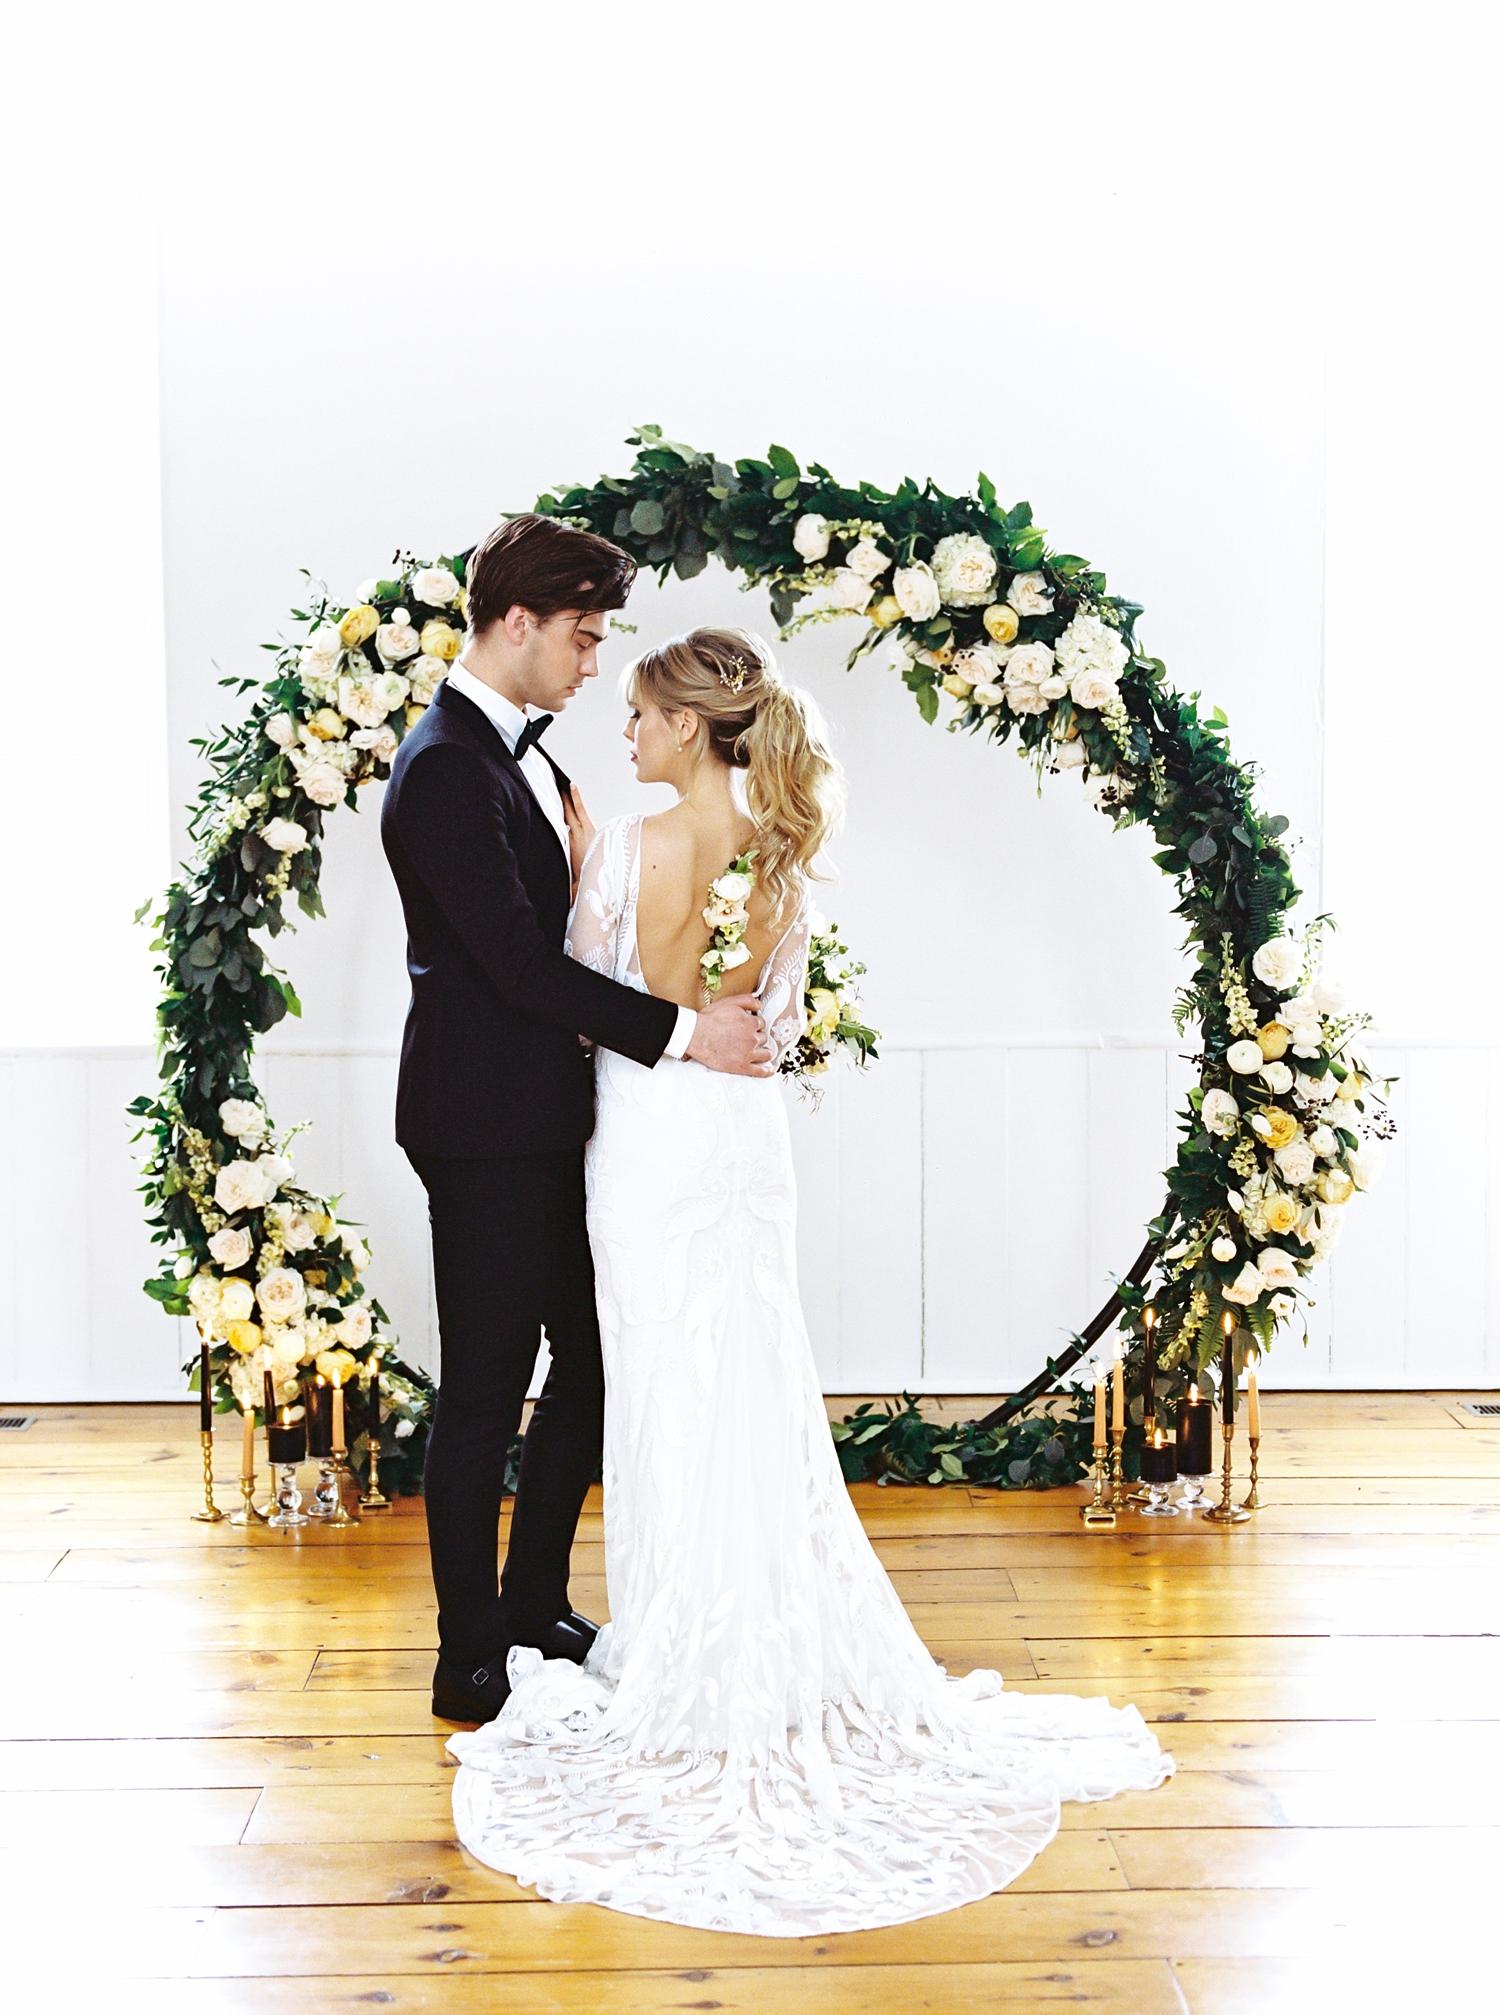 Rosenlee Photography Wedding Inspiration_0015.jpg